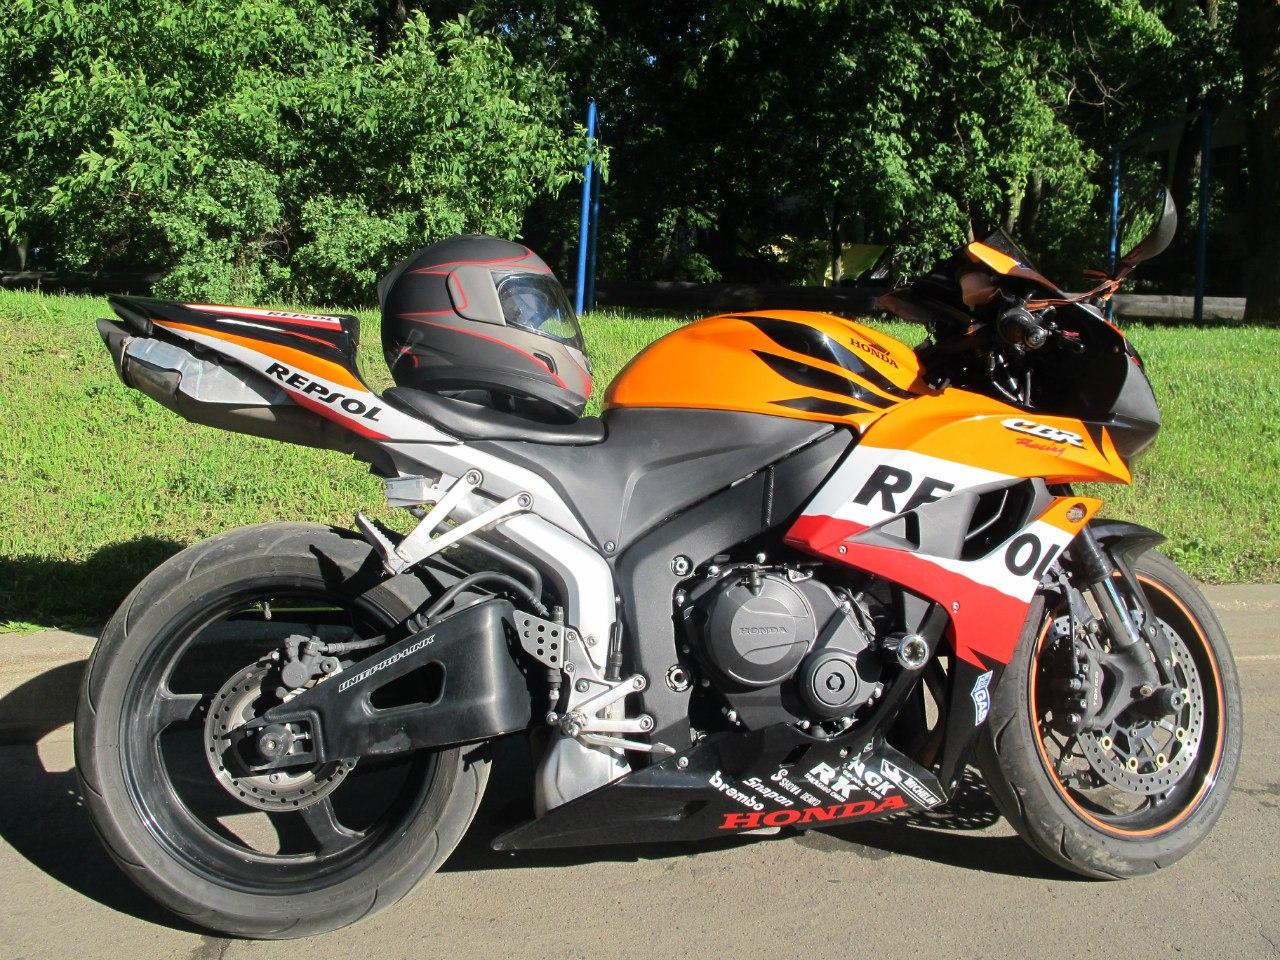 Honda CBR600RR – купить мотоцикл Honda, цены